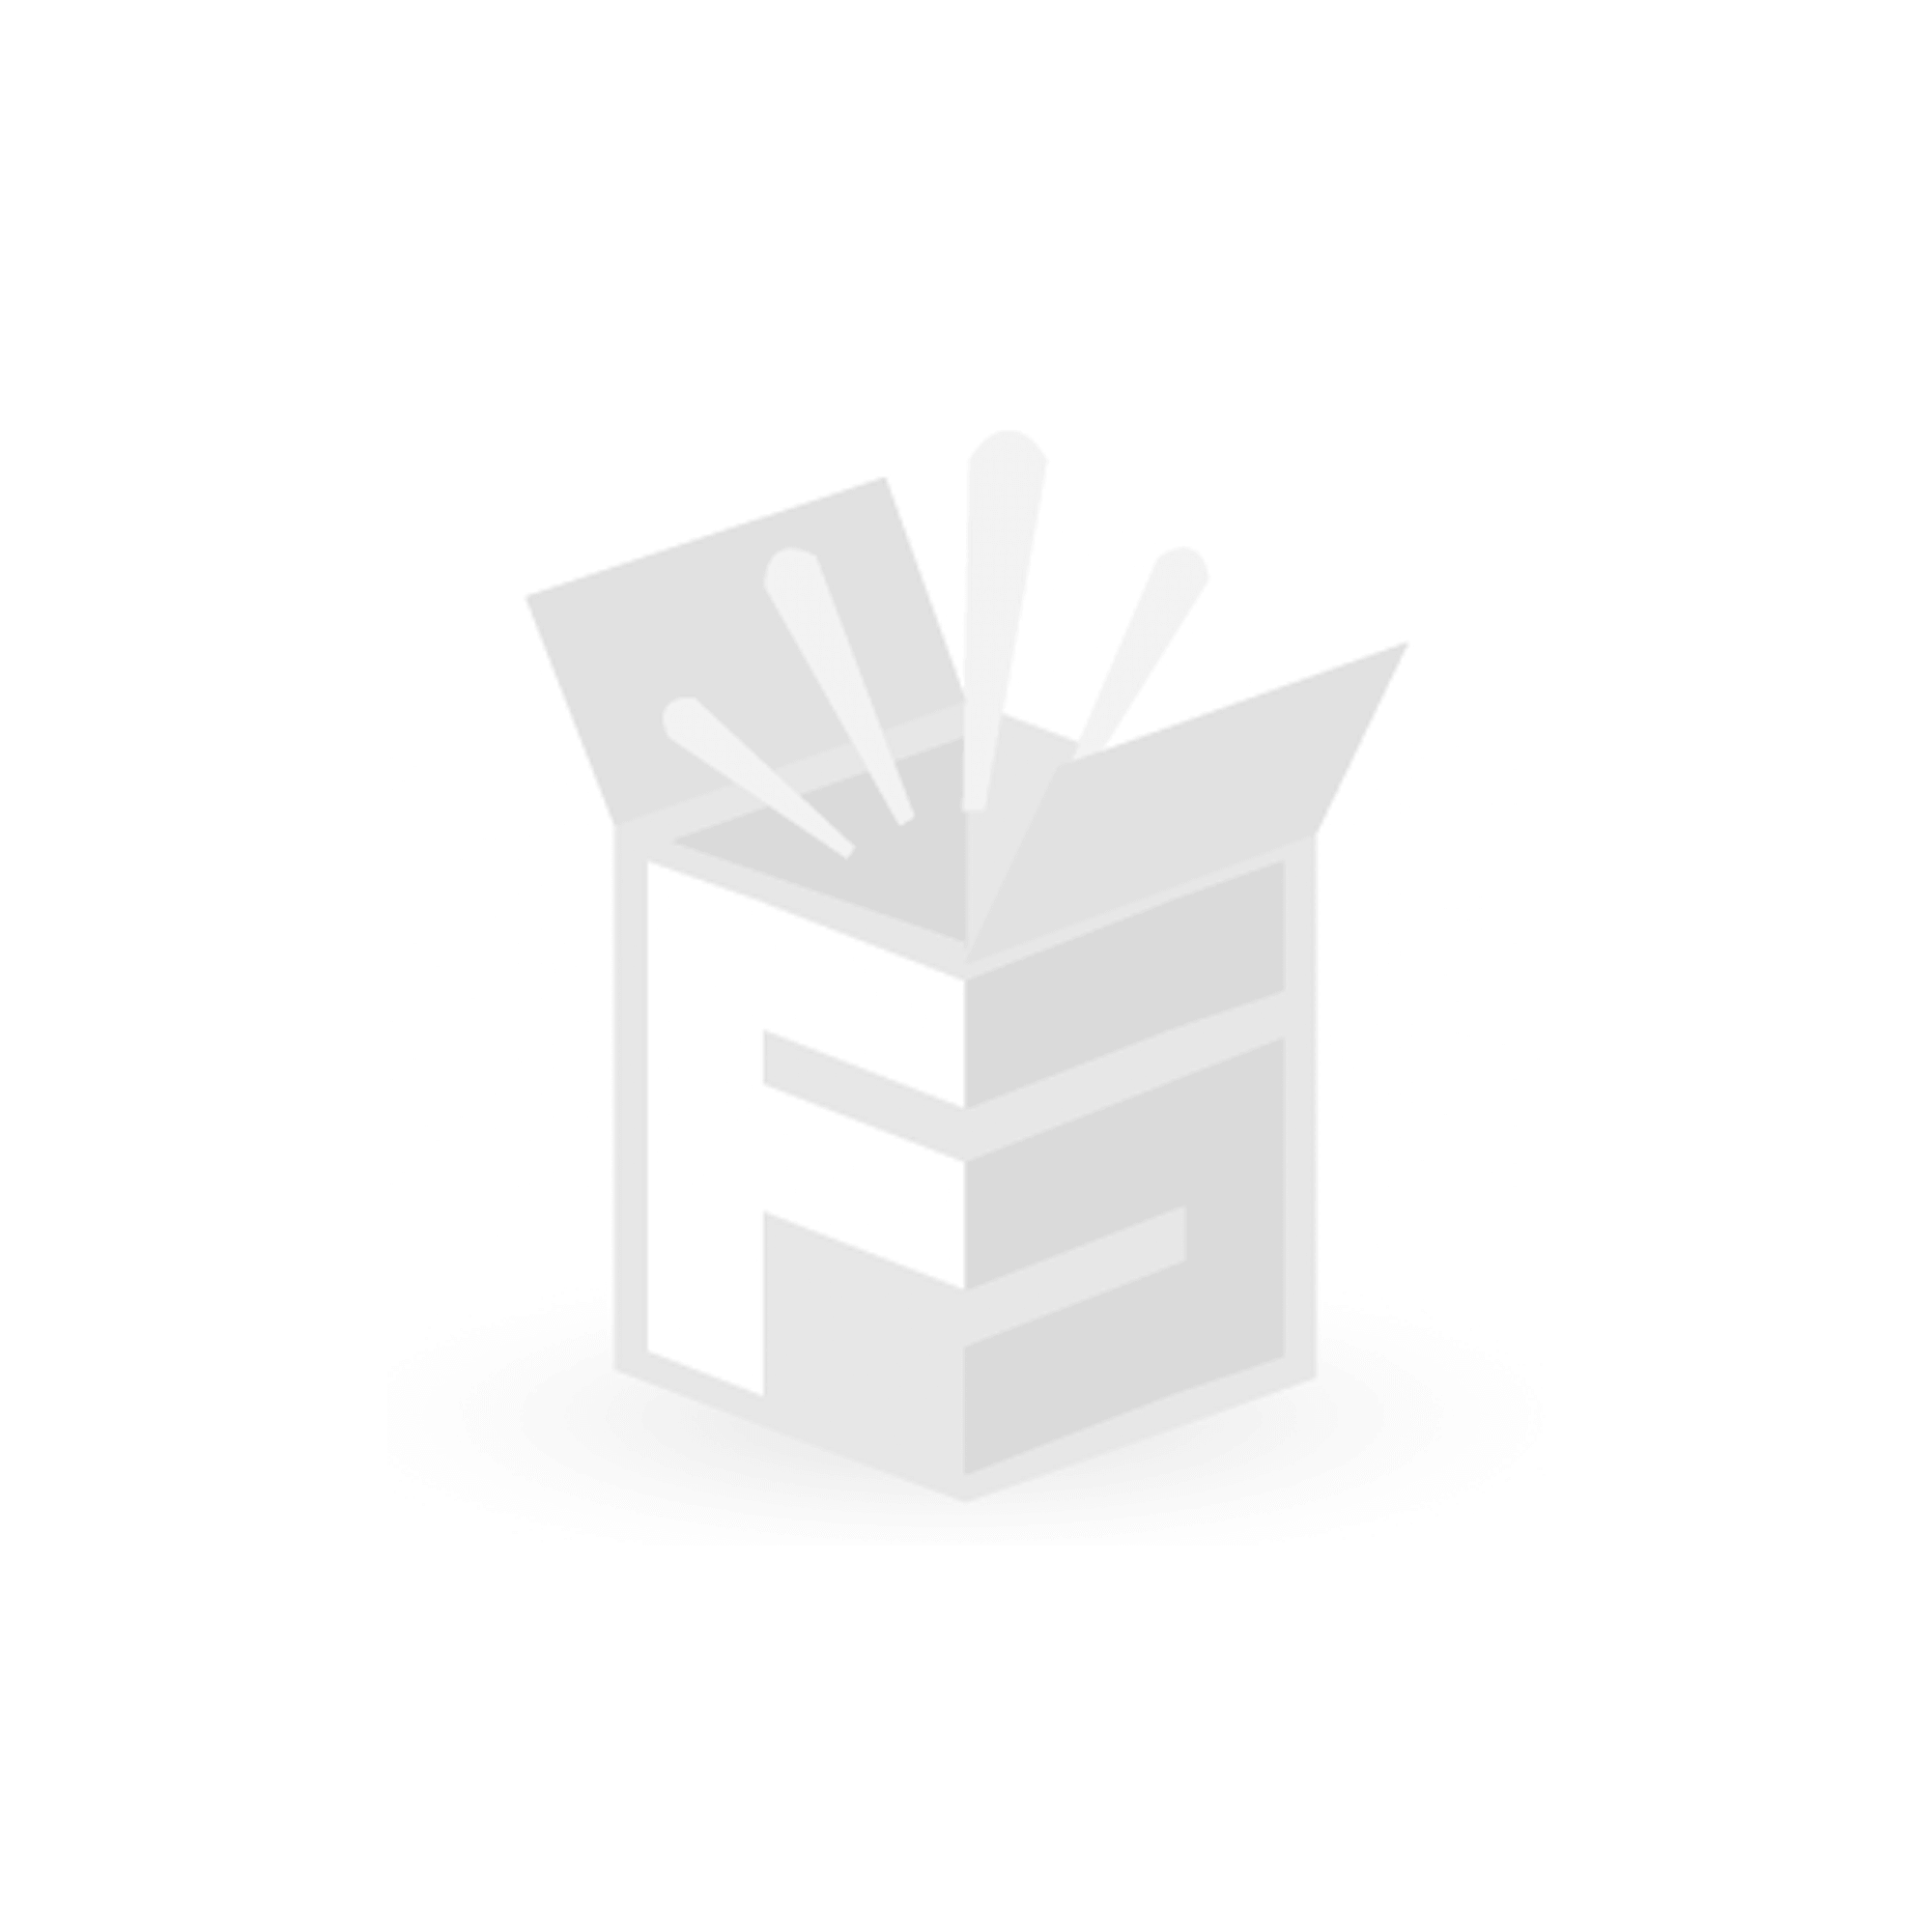 FS-STAR Latte Macchiato-Gläser-Set 2-teilig, doppelwandig